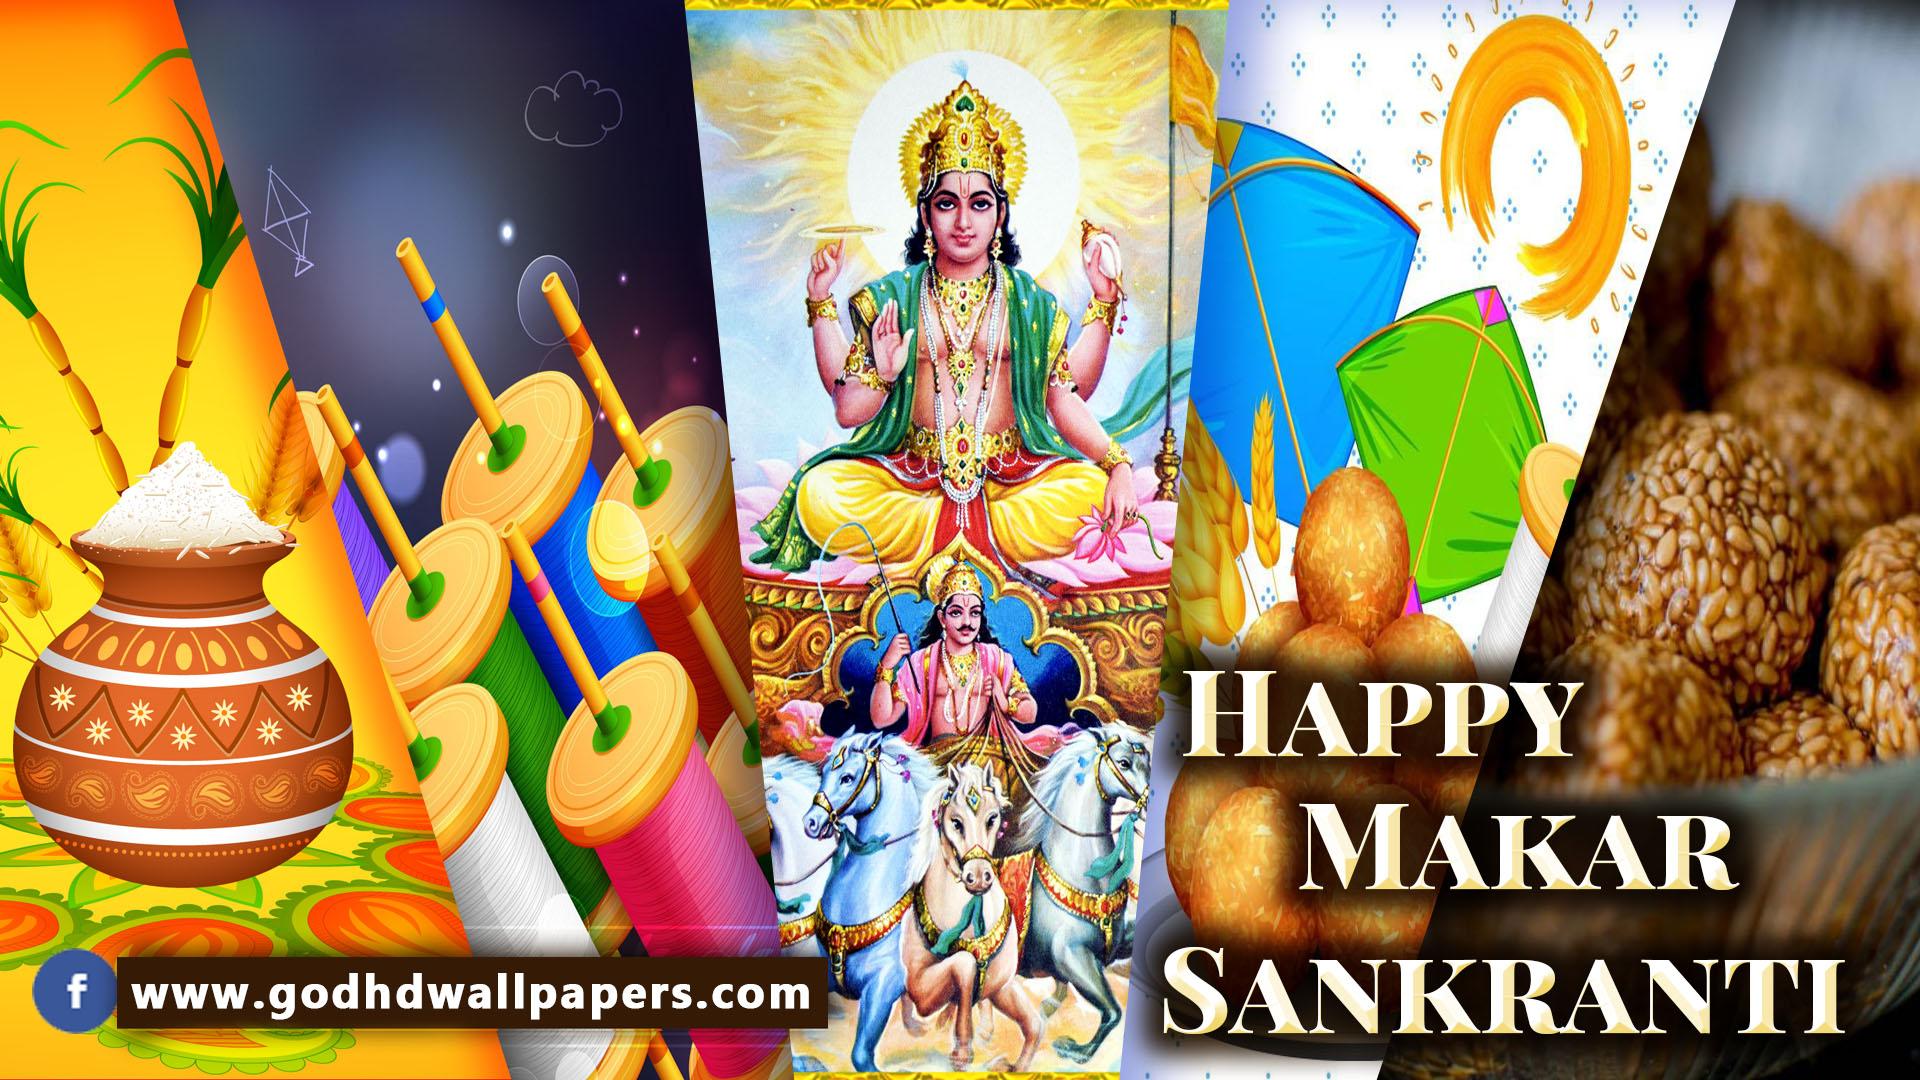 Happy Makar Sankranti 2019 Whatsapp Dp Pics Photos Wallpapers 1080P